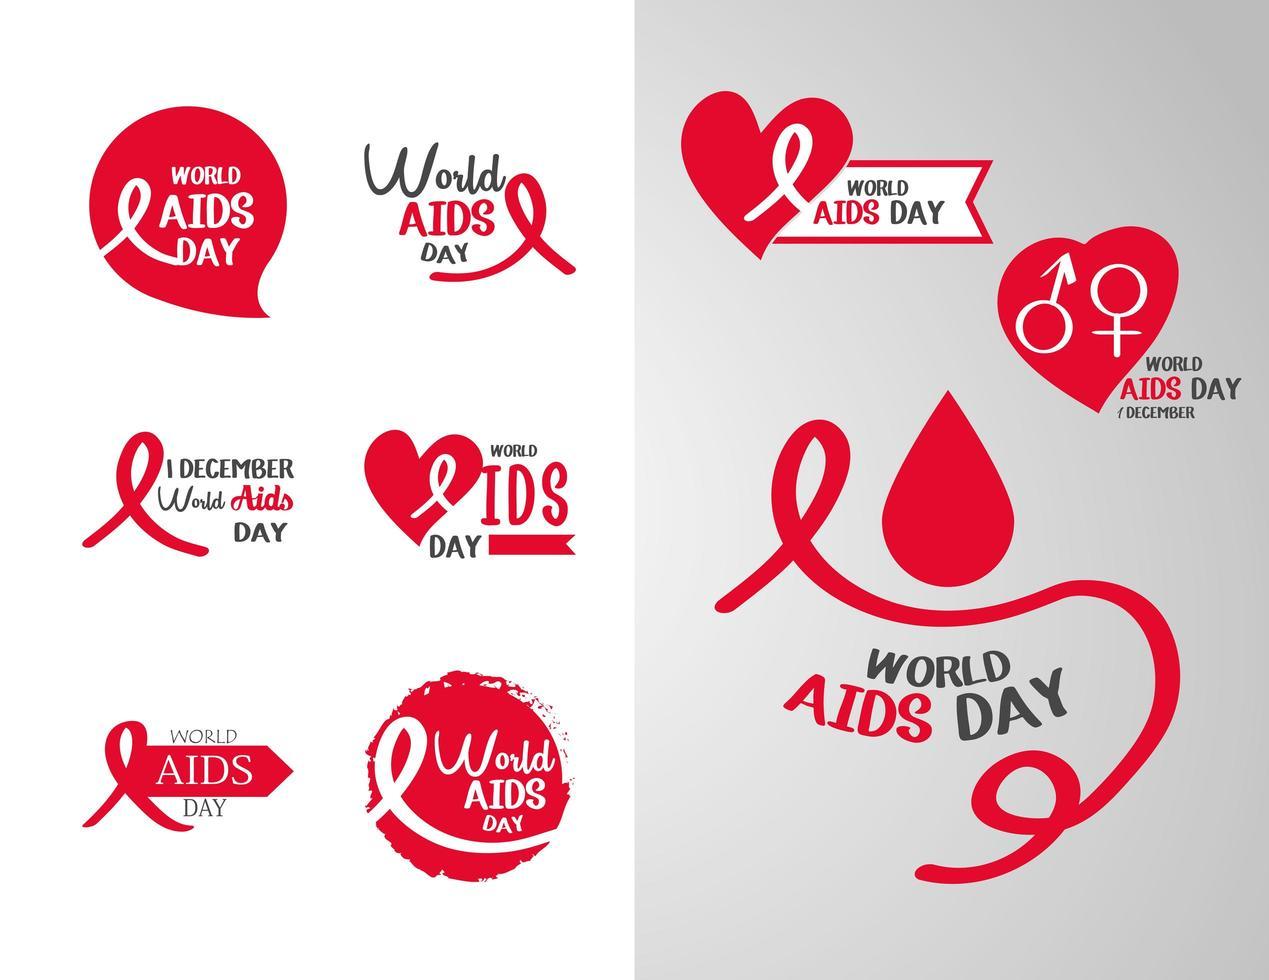 World Aids Day Awareness Icon Sammlung vektor